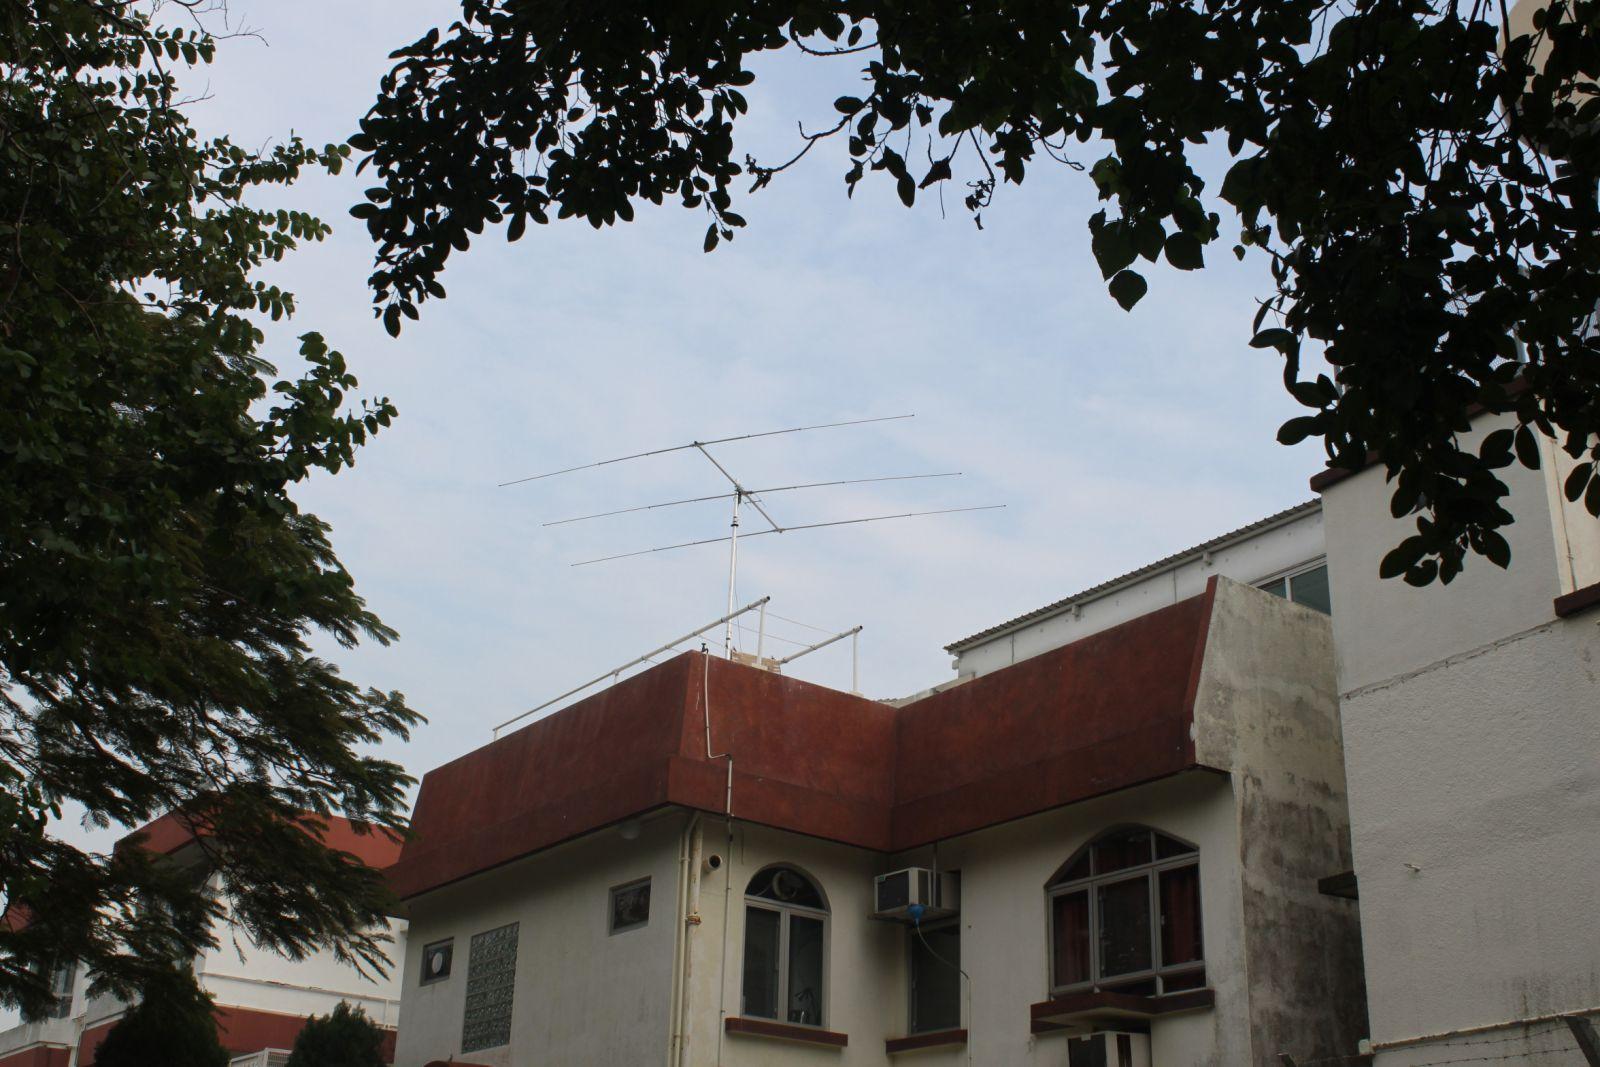 Peng Chau Island VR2/IV3TAN House